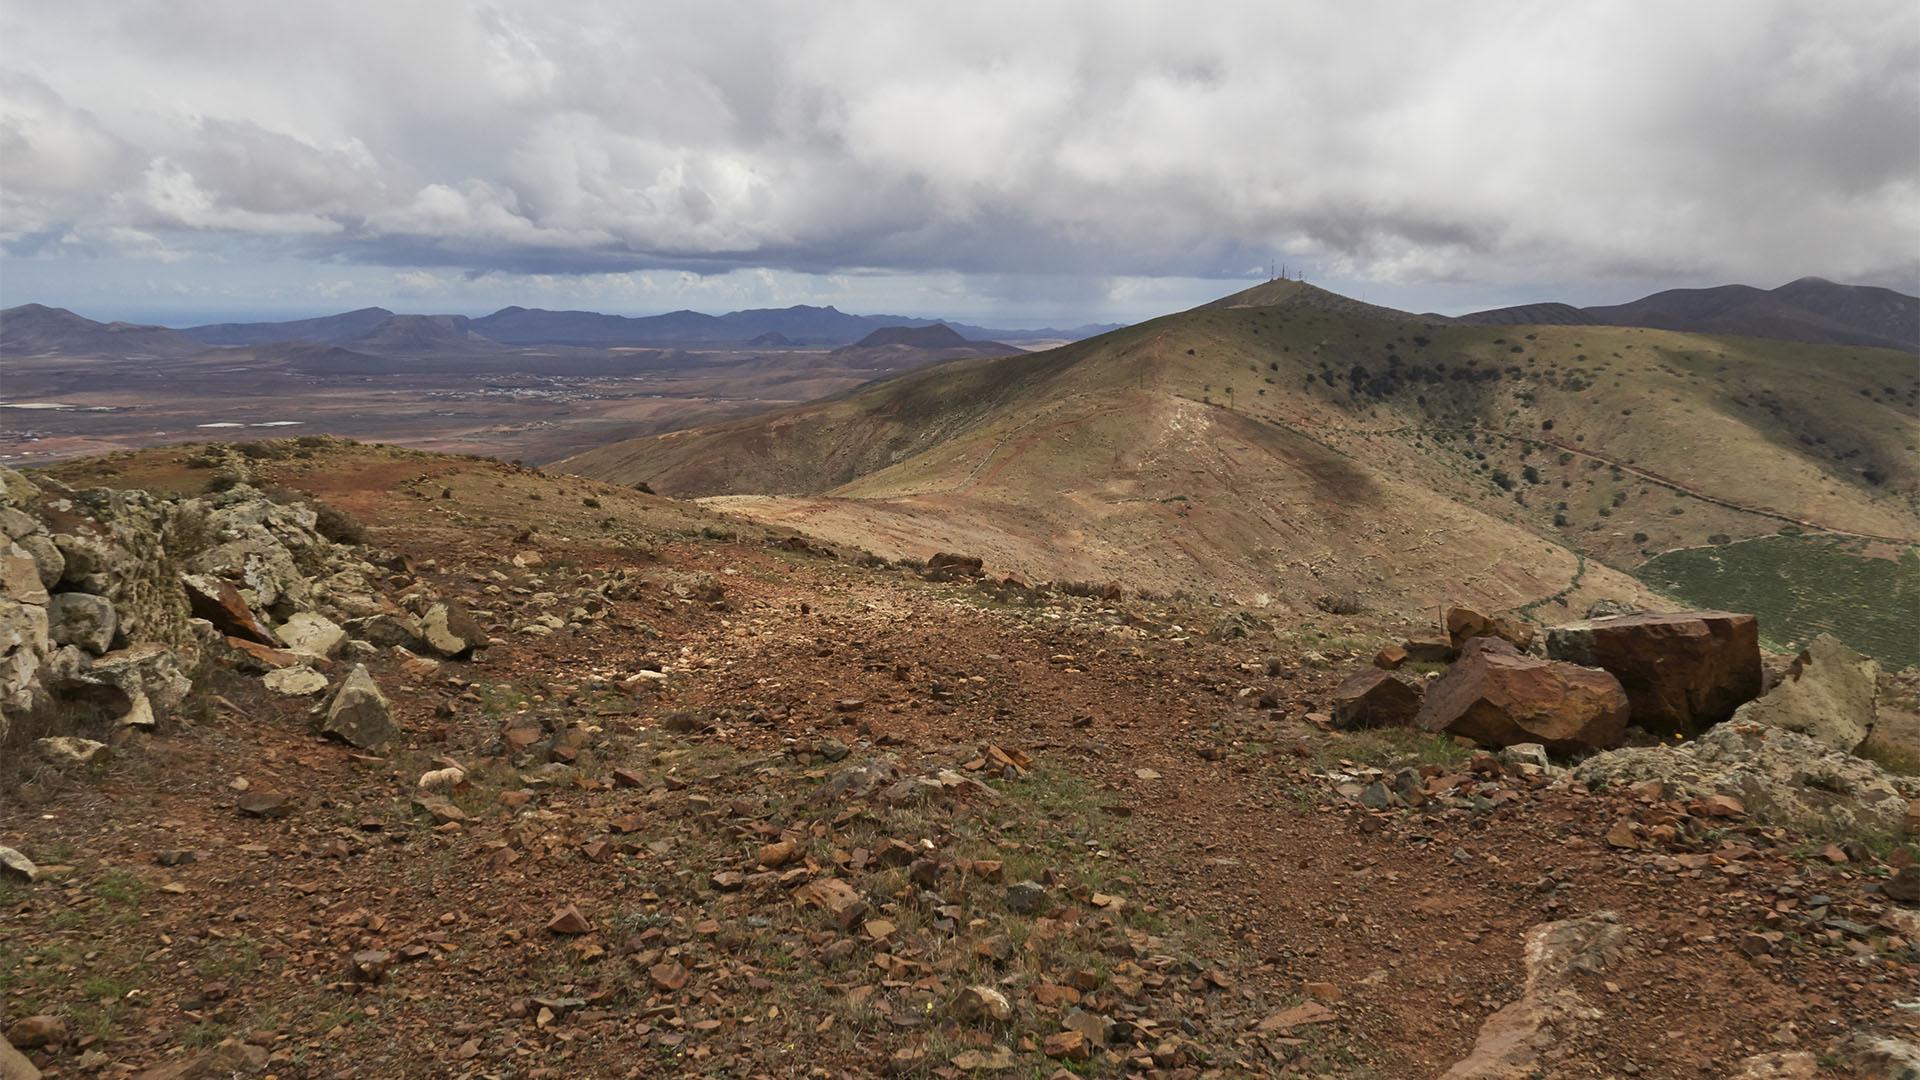 Unterwegs am Höhenweg zum Mirador de Morro Velosa.